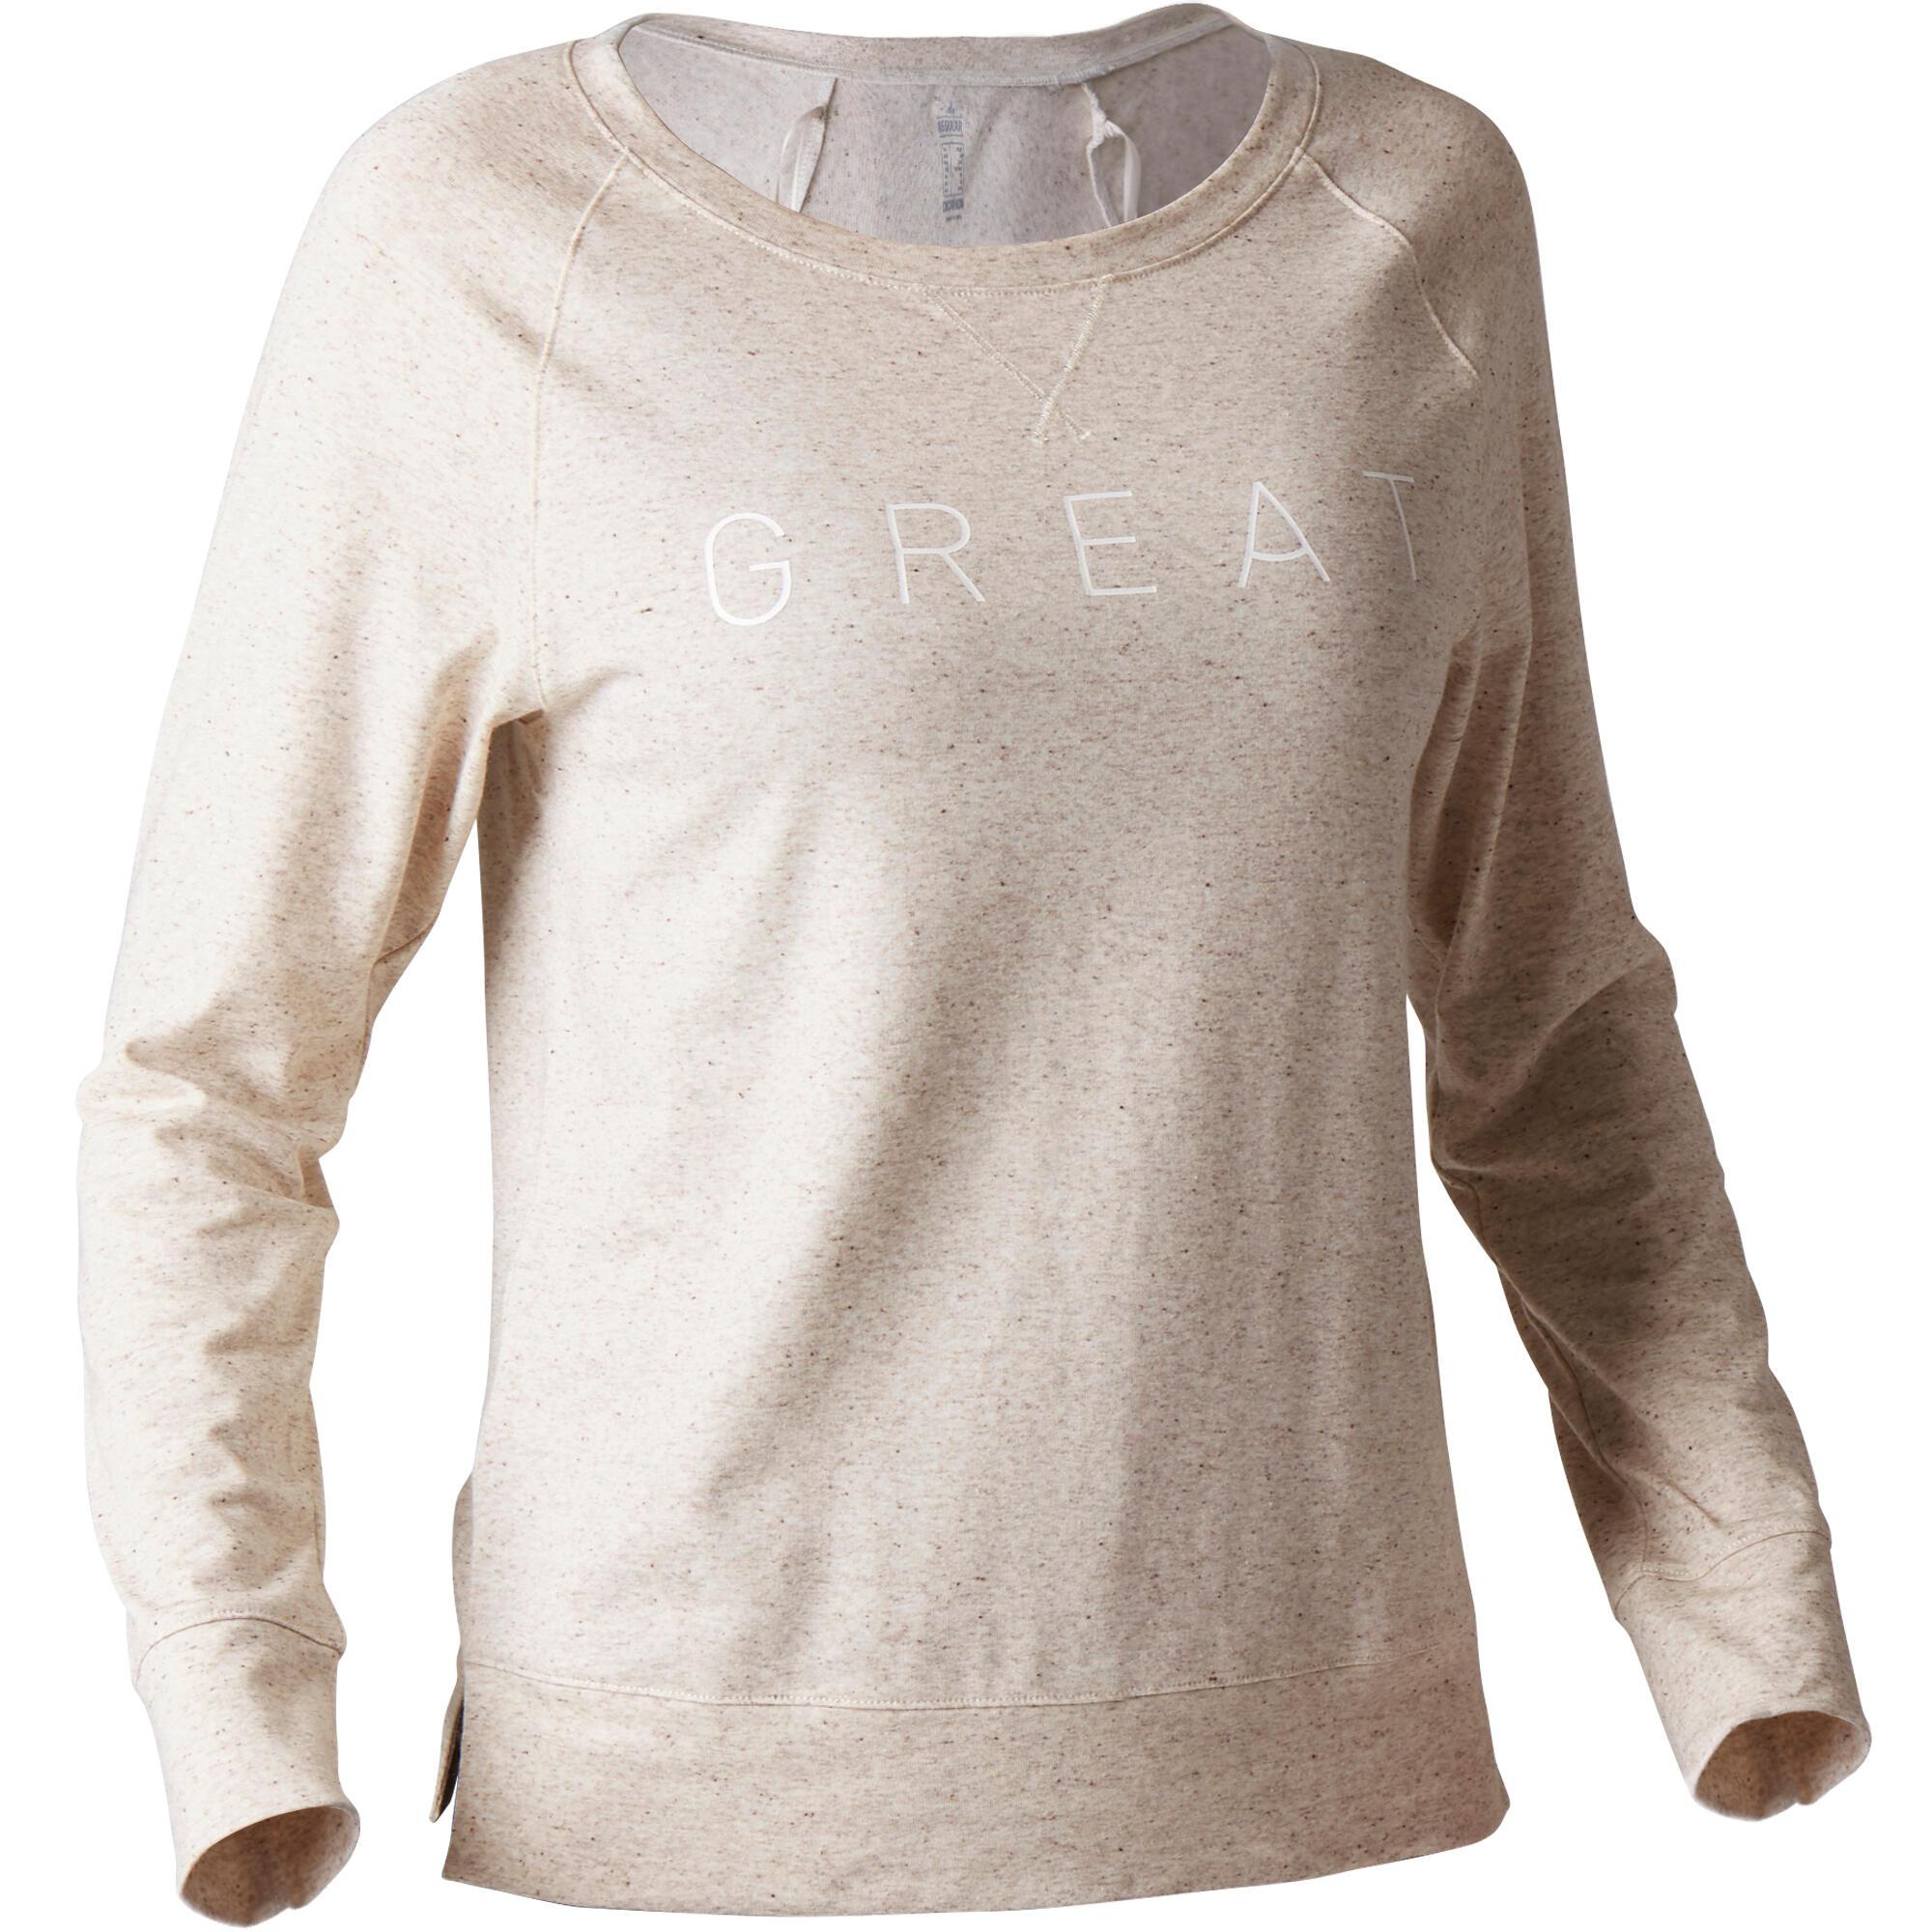 Domyos T-shirt 500 lange mouwen pilates en lichte gym dames